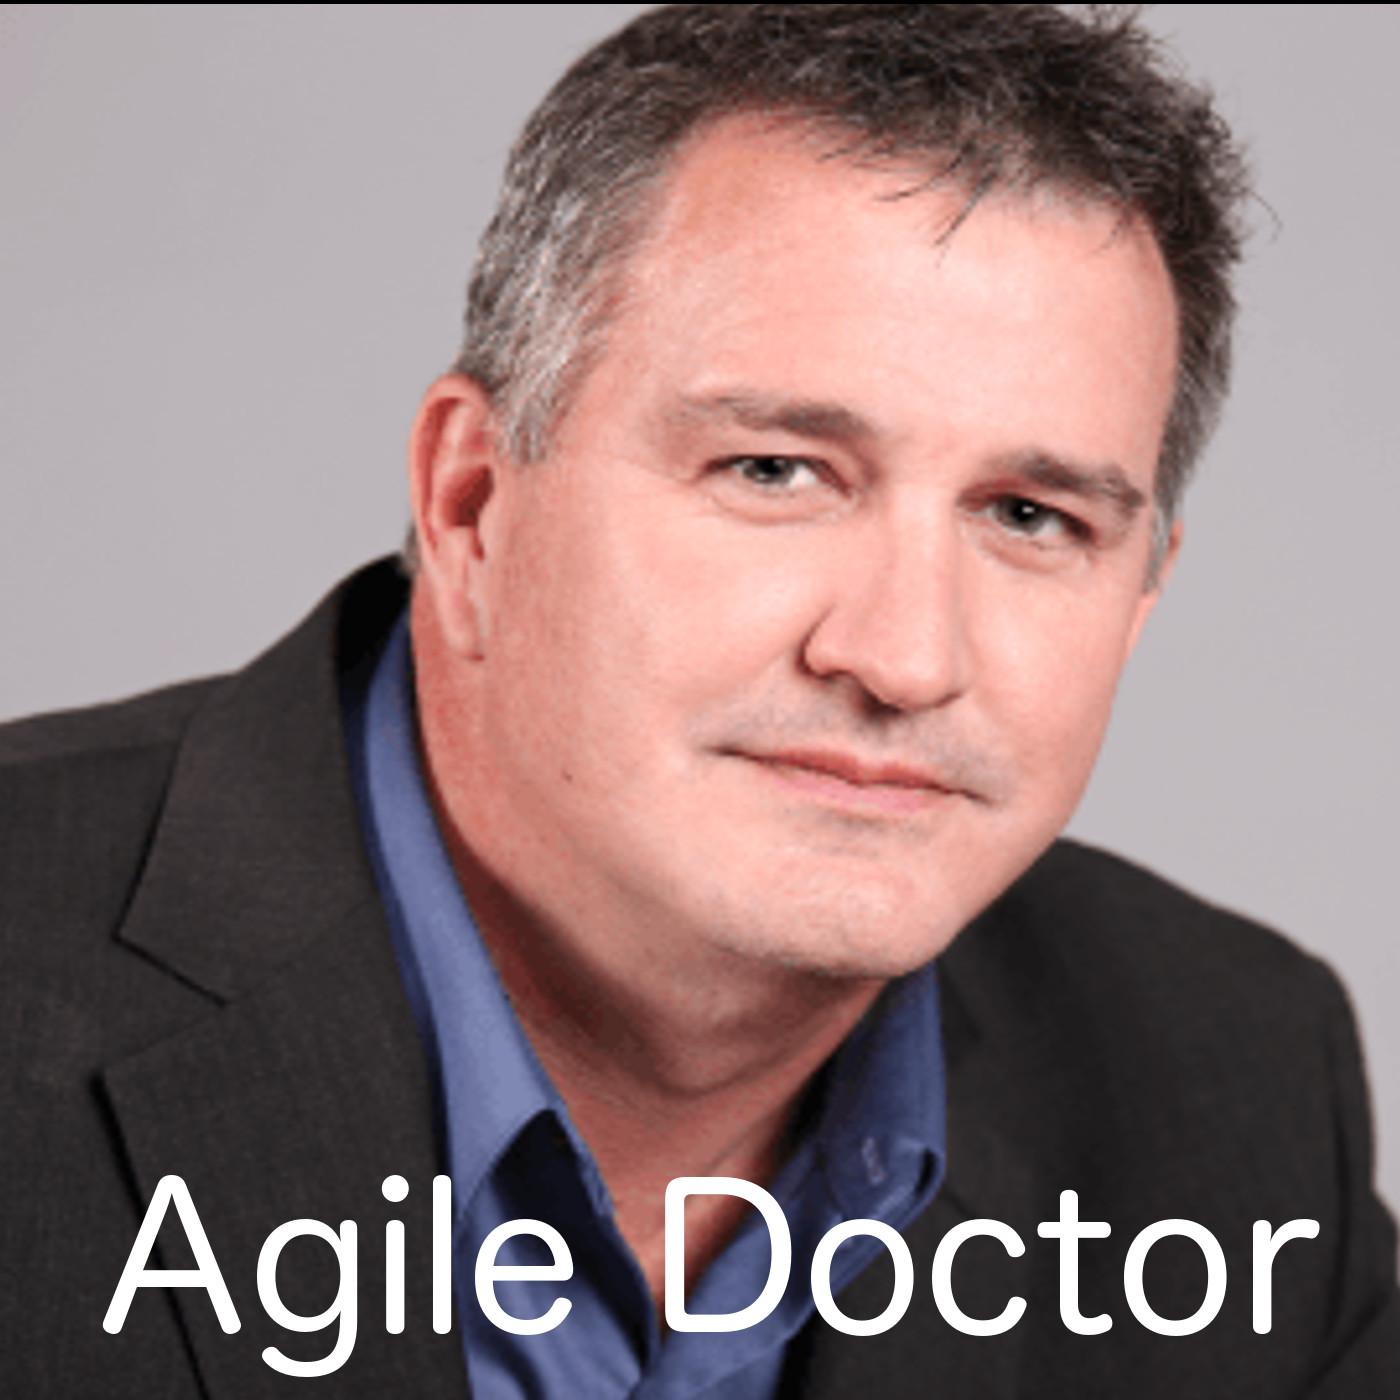 Agile Doctor